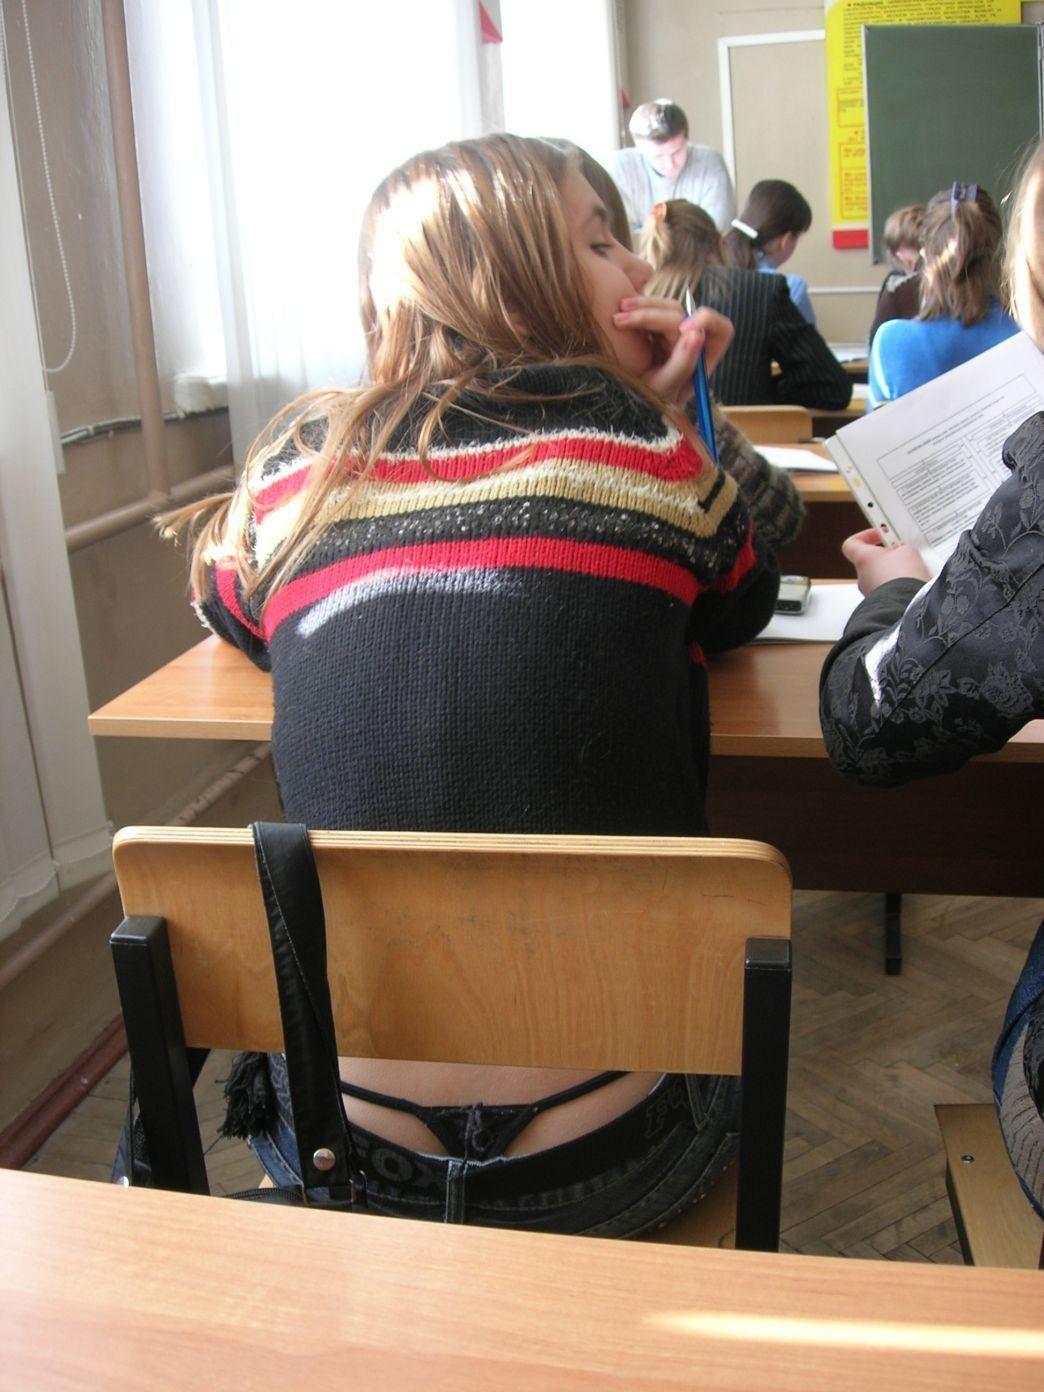 Panty Cock Porn